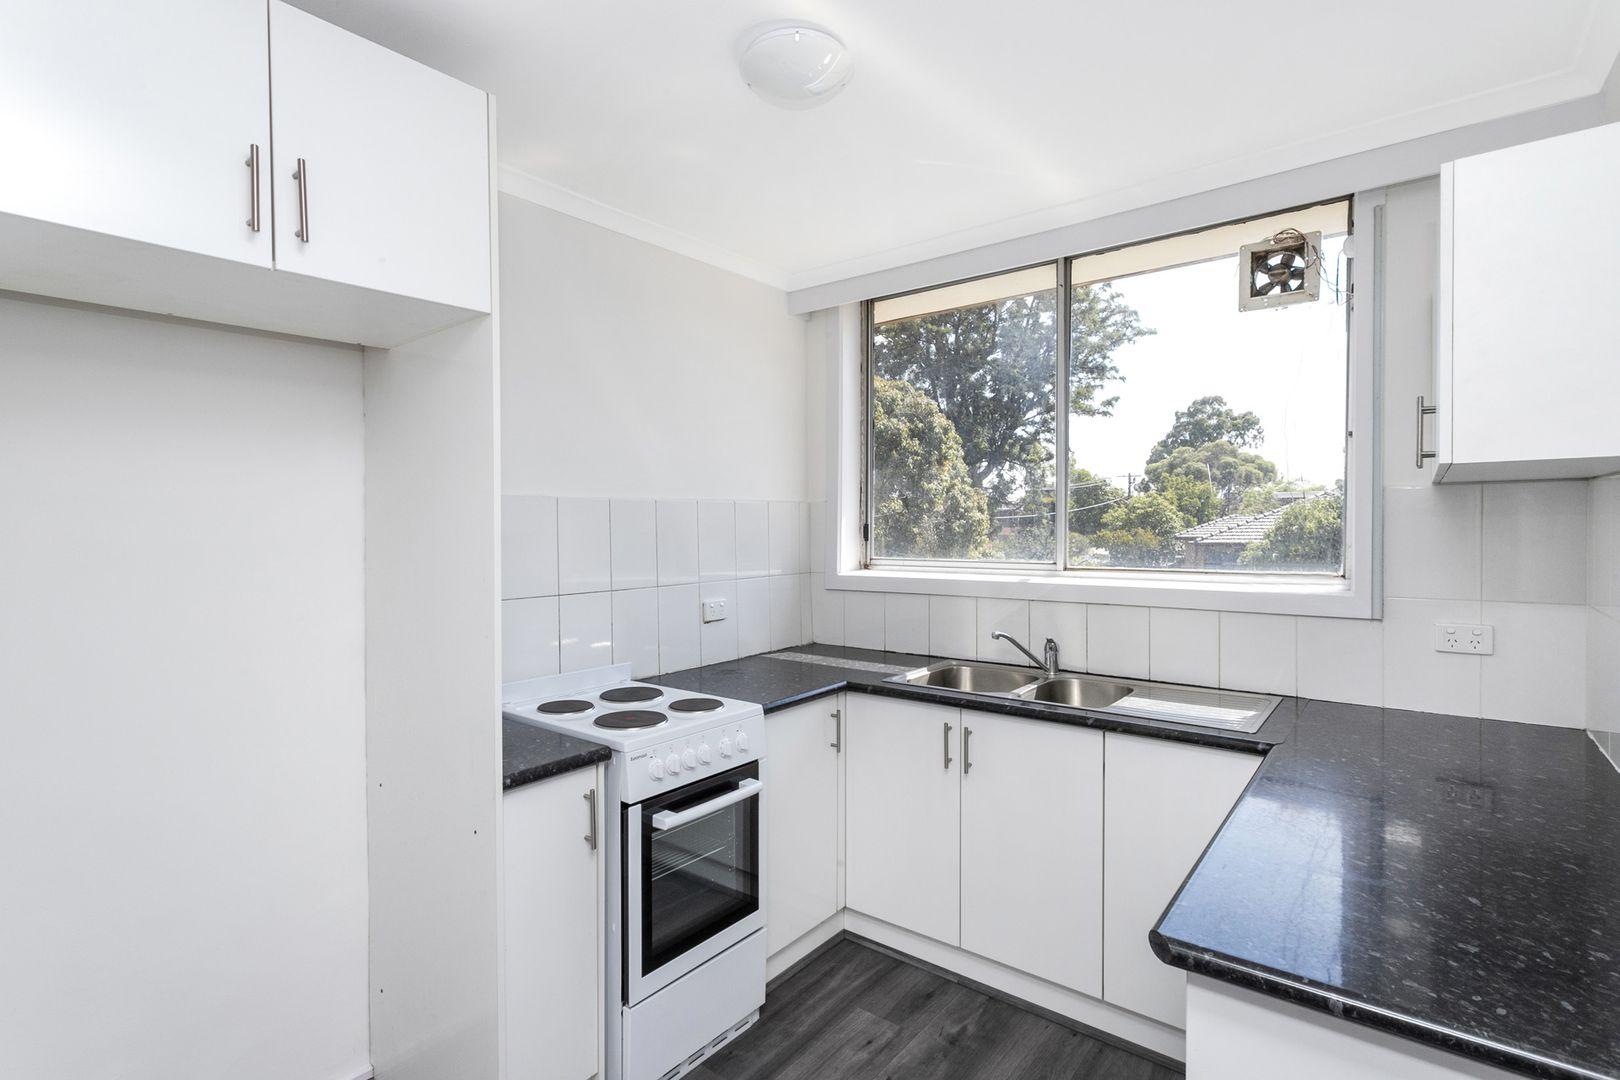 5/18 Eldridge Street, Footscray VIC 3011, Image 1